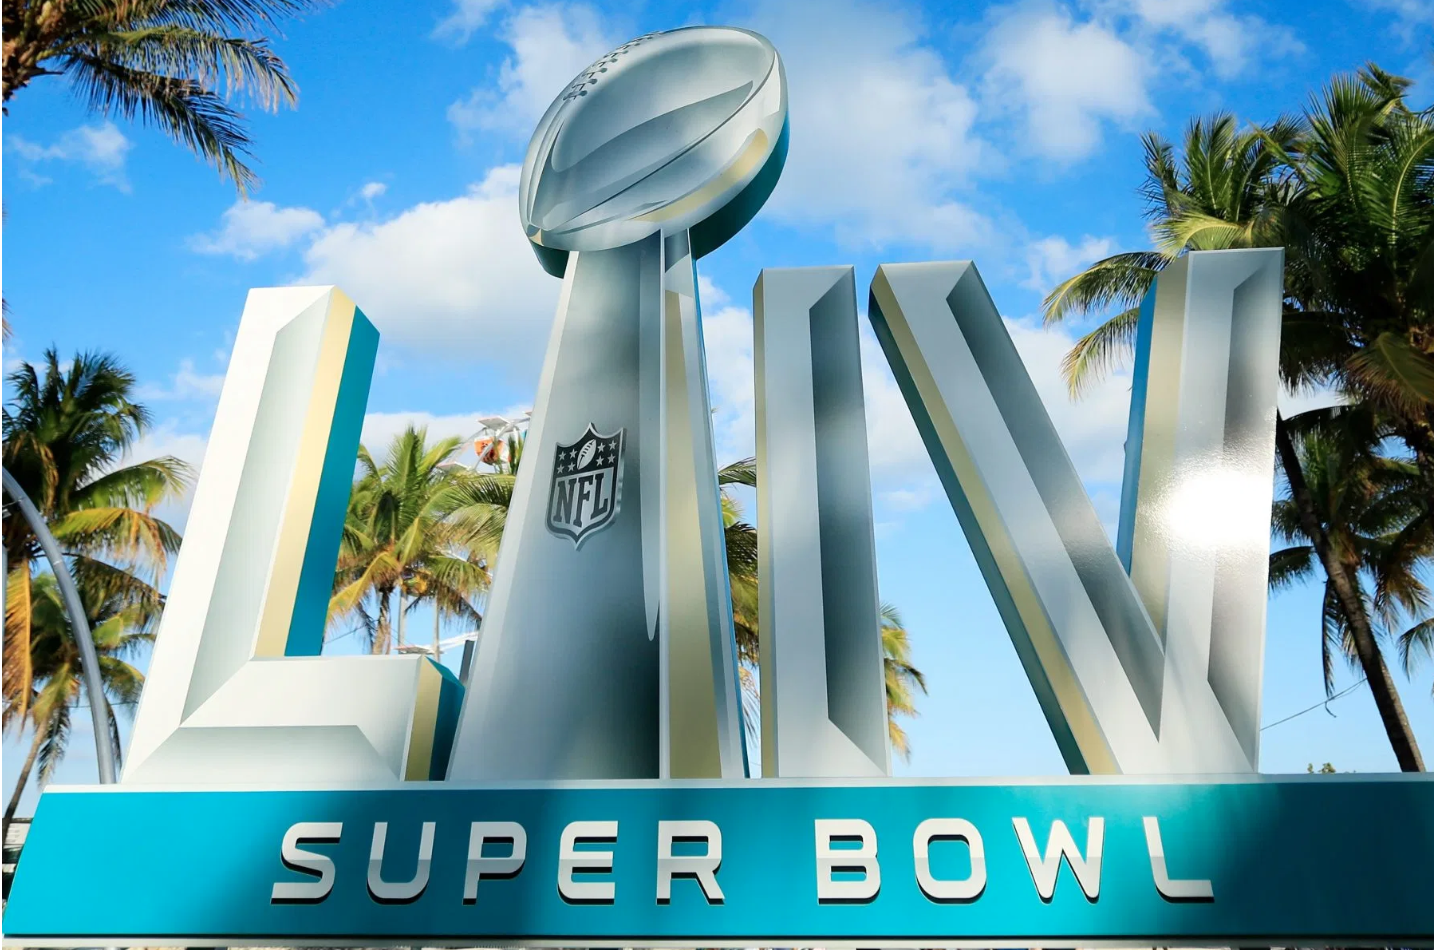 American Sign Language during Super Bowl LIV